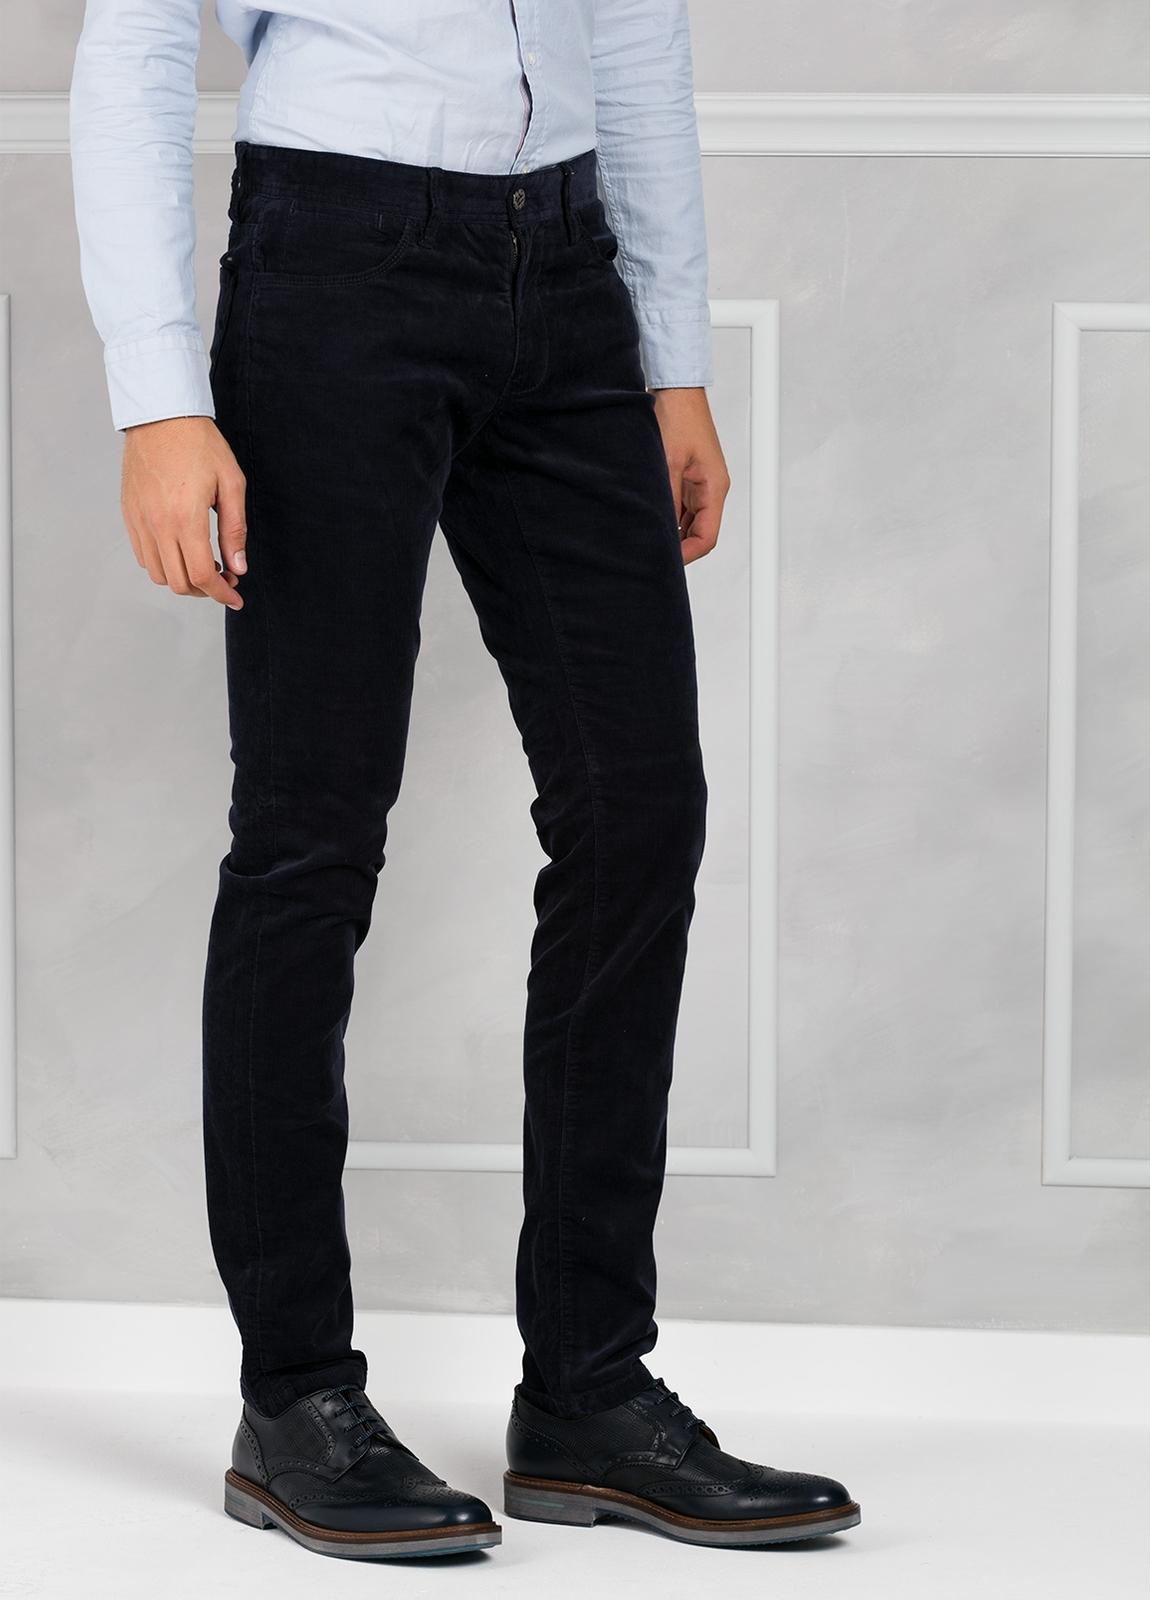 Pantalón 5 bolsillos micropana modelo FRED color azul marino. 98% Algodón 2% Elastano. - Ítem1